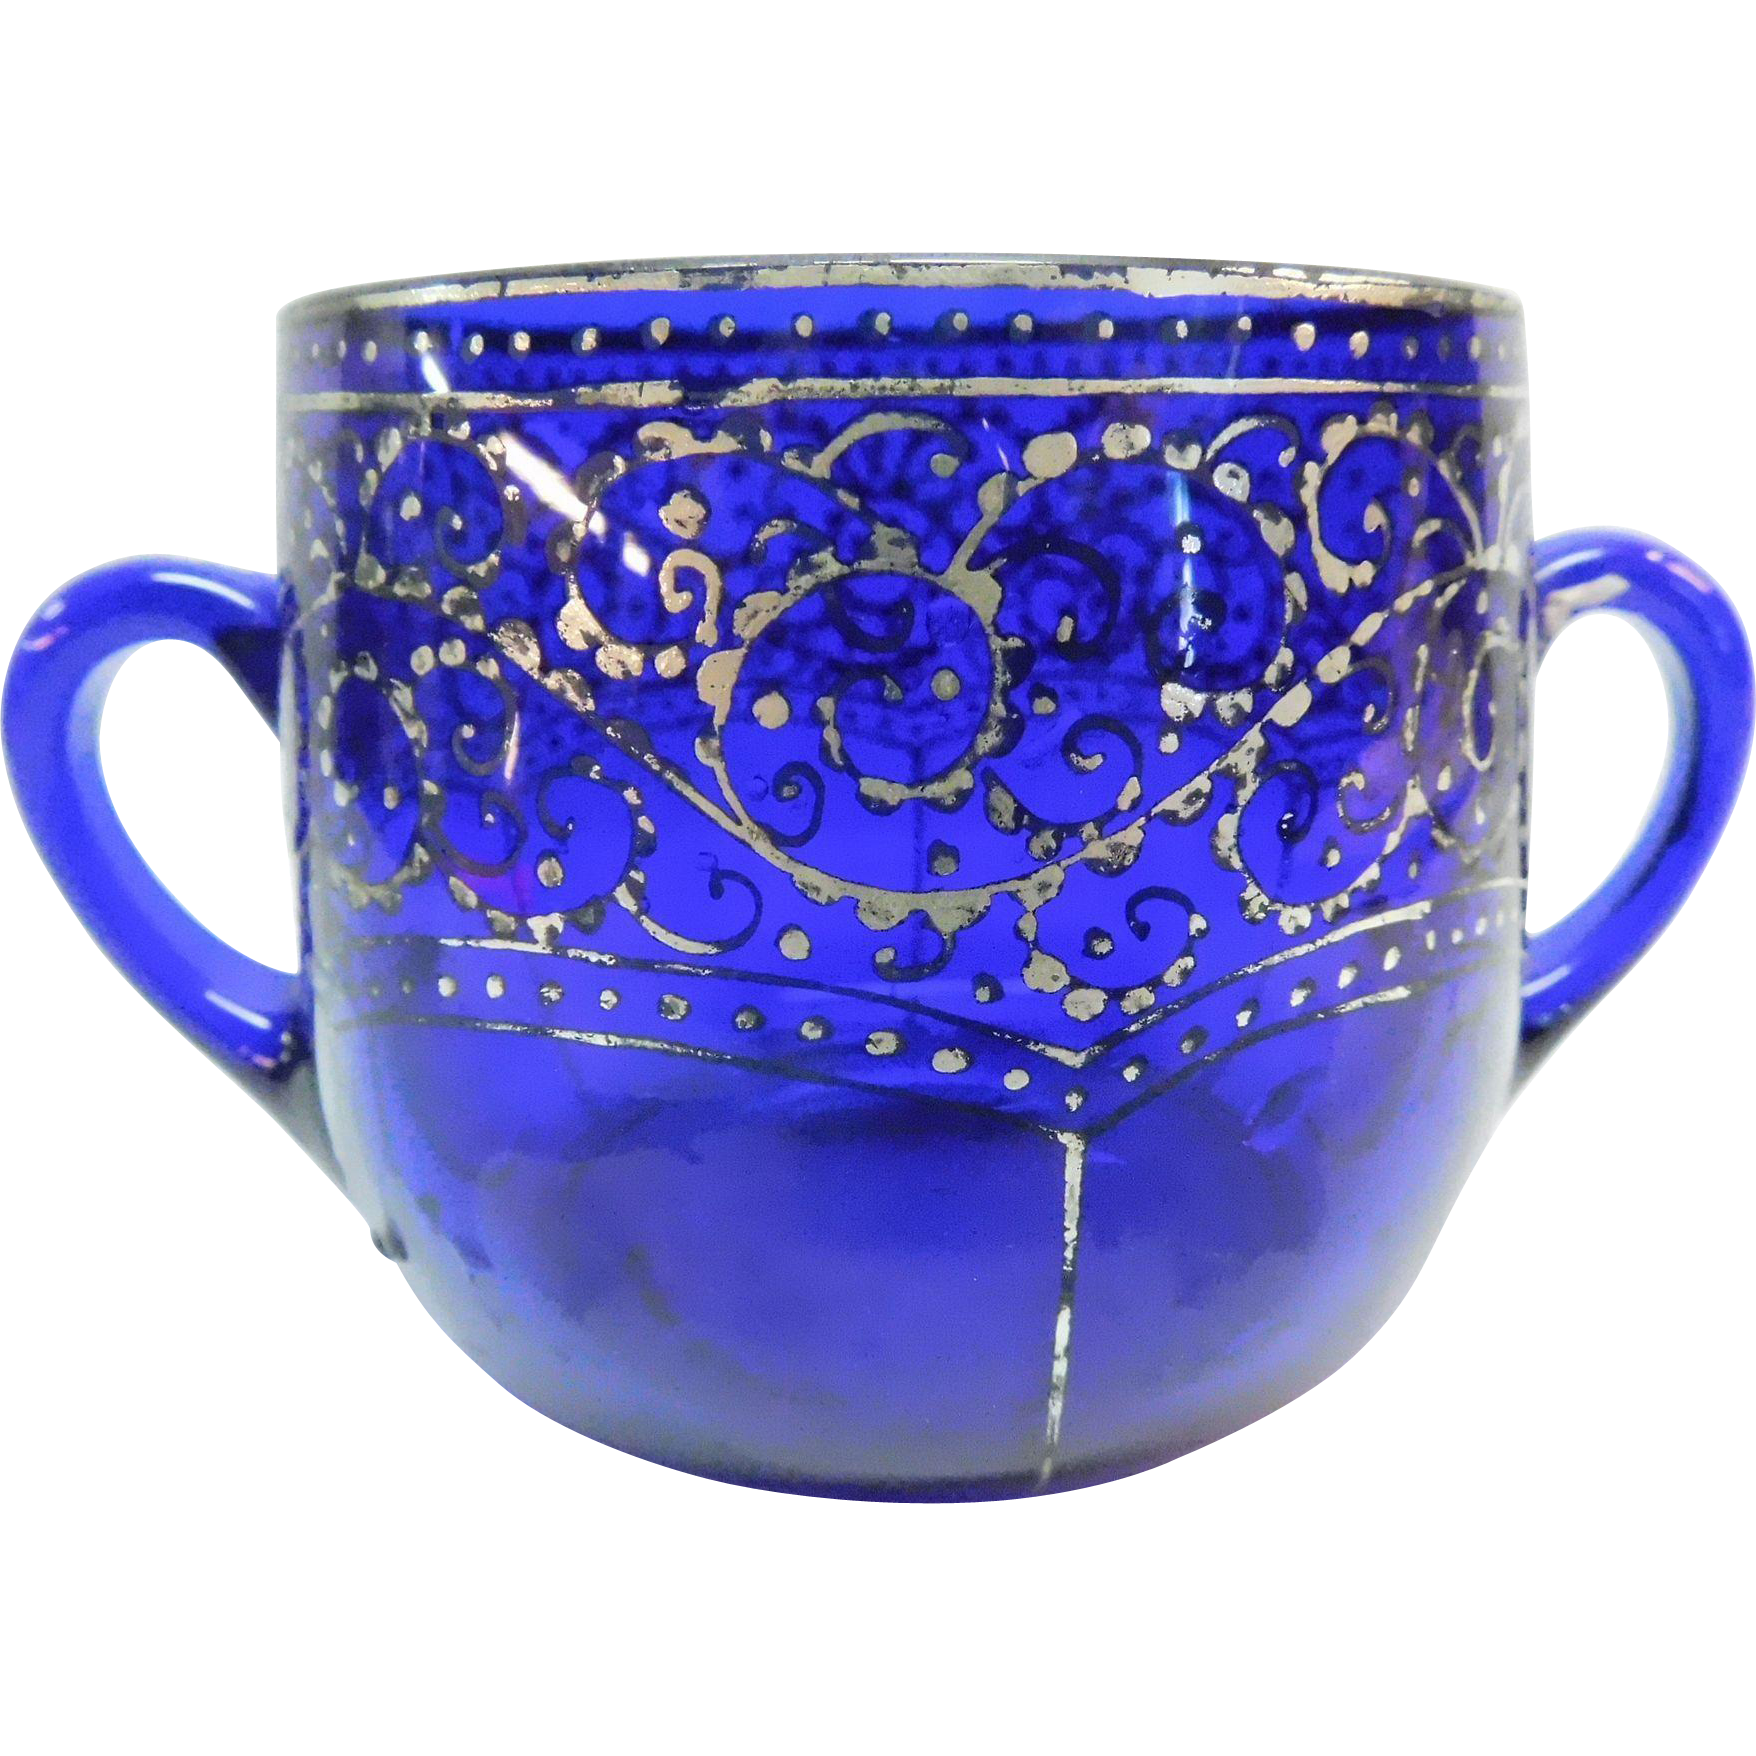 Cobalt Blue Sugar Bowl With Silver Overlay Czecho - Slovakia